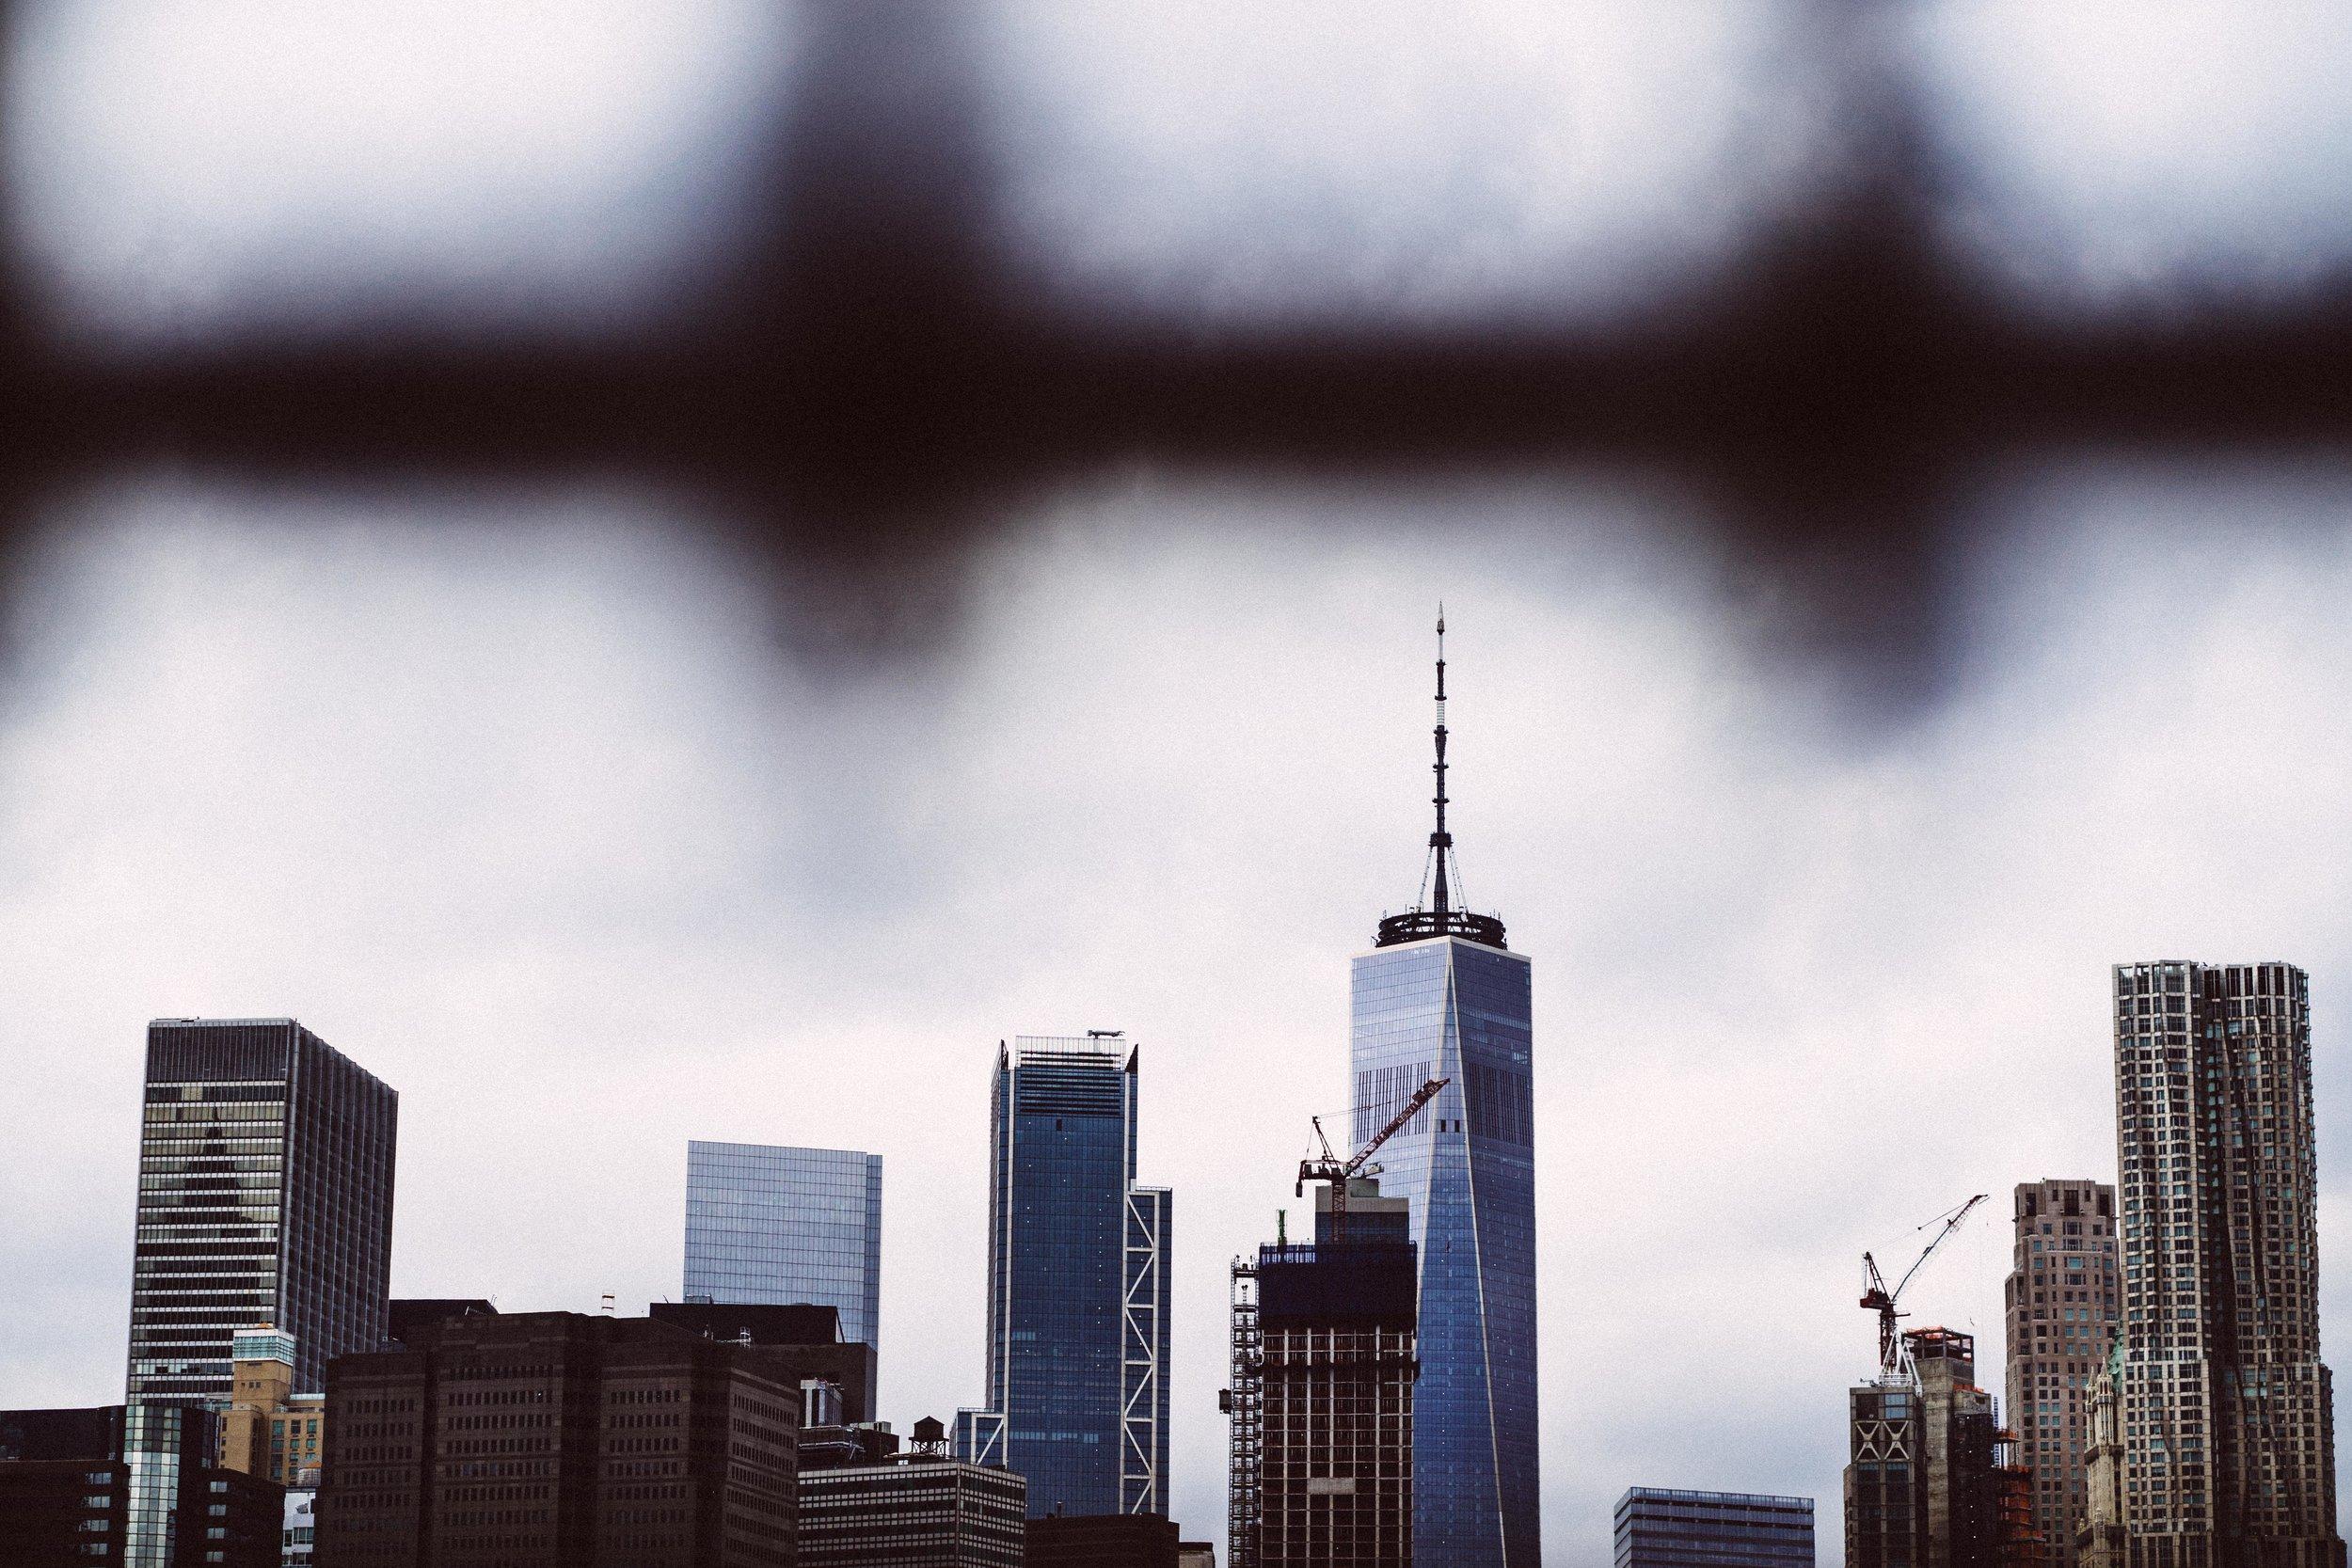 newyork-sony-102004.jpg